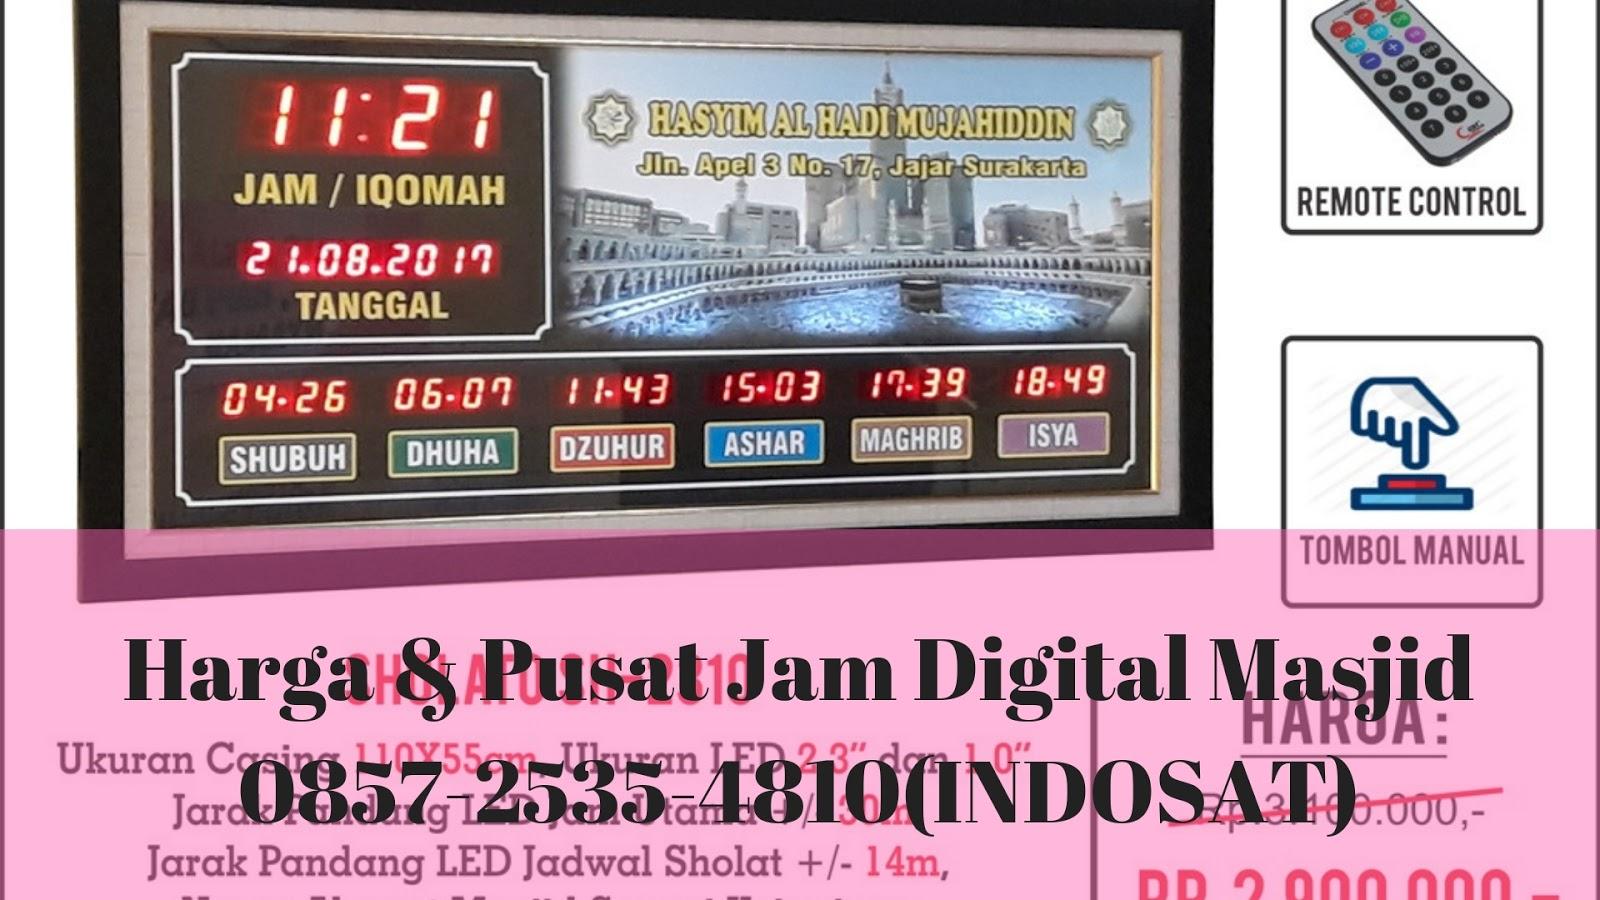 0857 2535 4810 Wa Tlp Pusat Jual Dan Beli Jam Masjid Digital